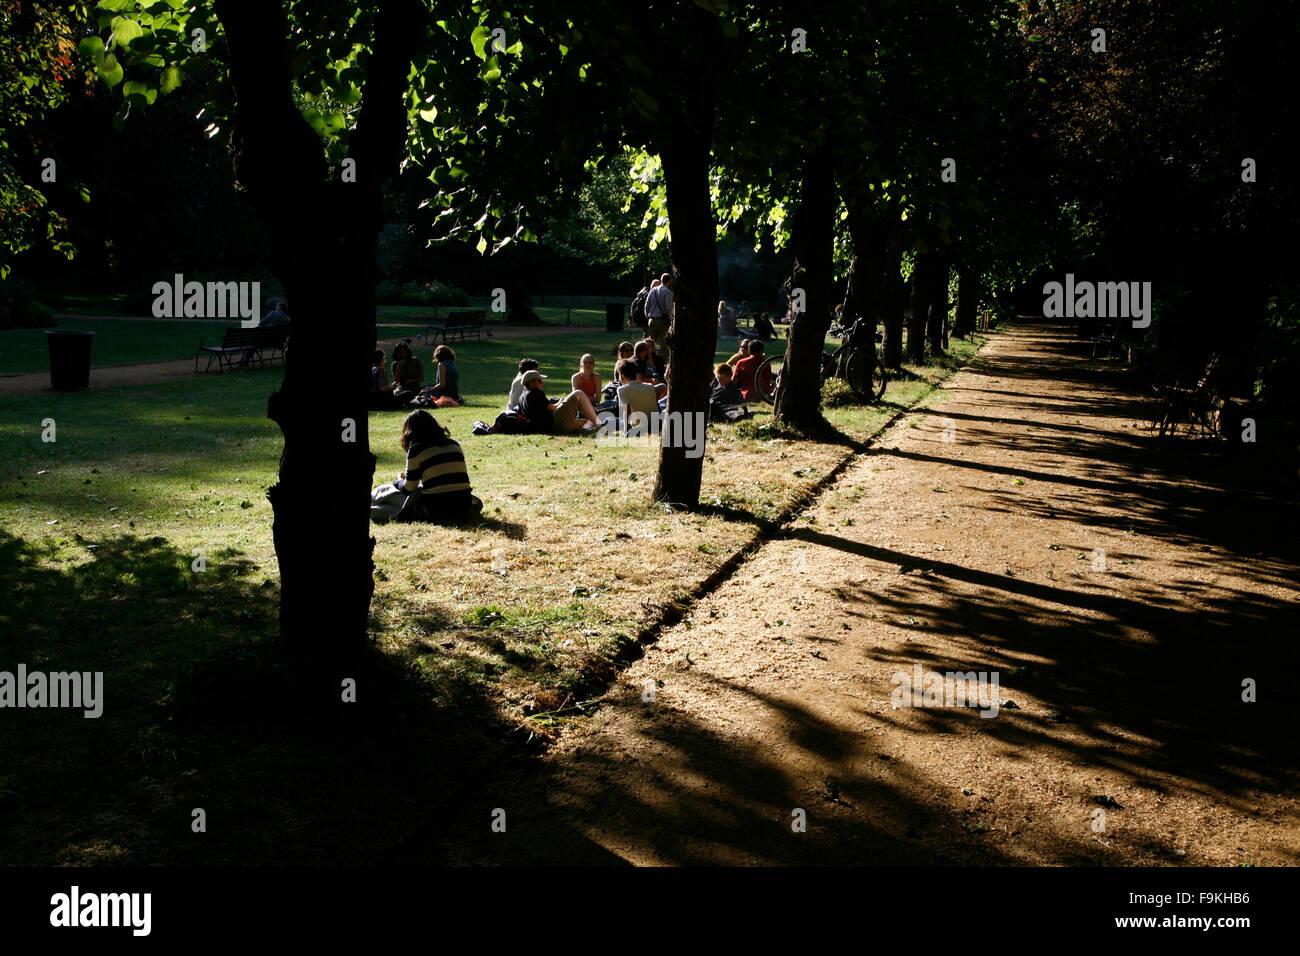 Gordon Square, Bloomsbury, London, UK - Stock Image